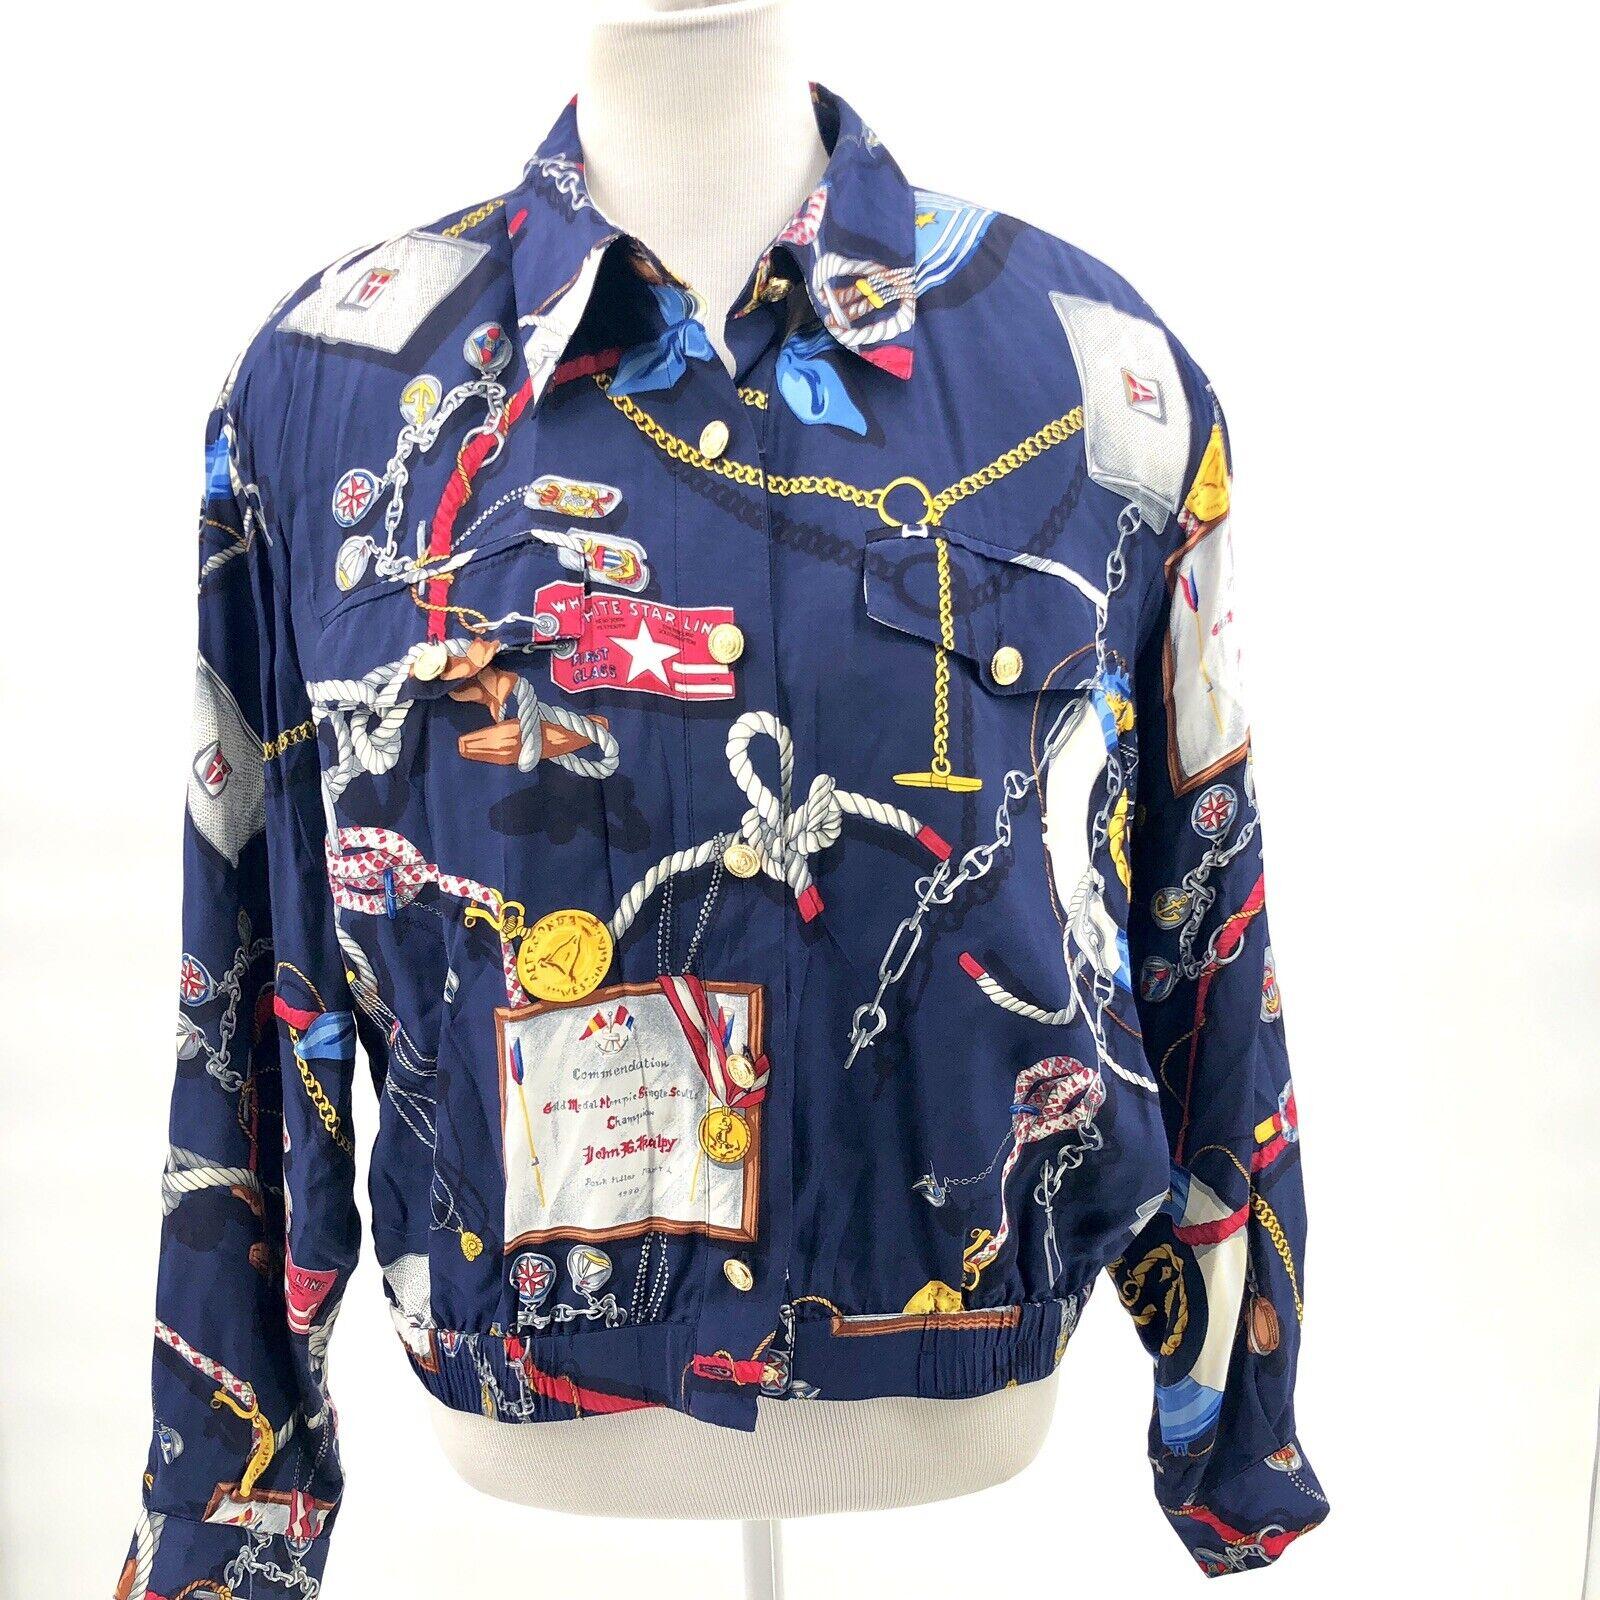 Colección Vintage Liz Claiborne Talla 12 Azul Azul Azul Náutica Botones Chaqueta De Vela a38aad